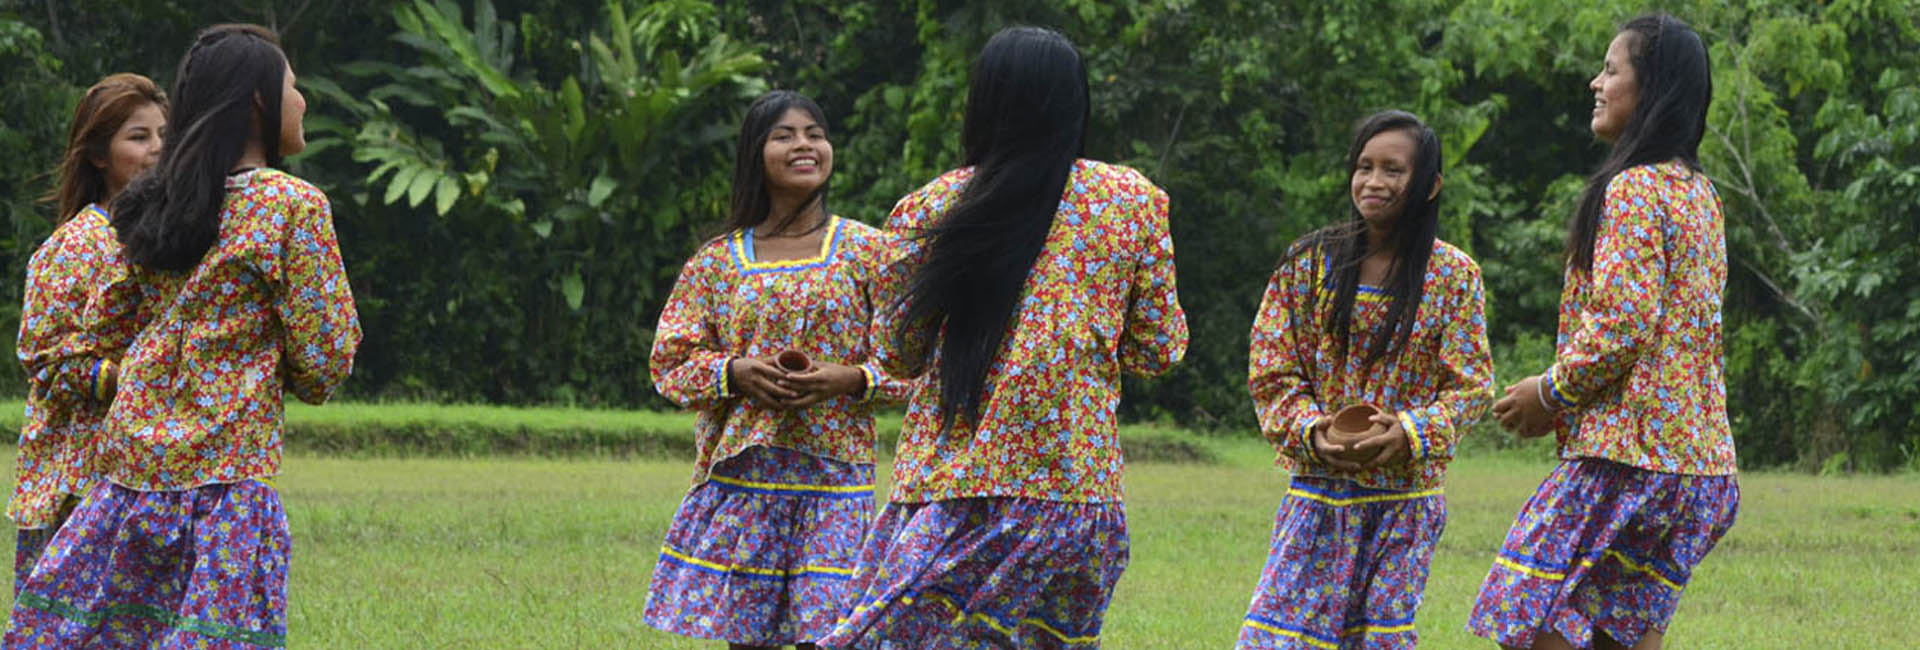 Amazonian Kichwa Indigenous Girls Dancing